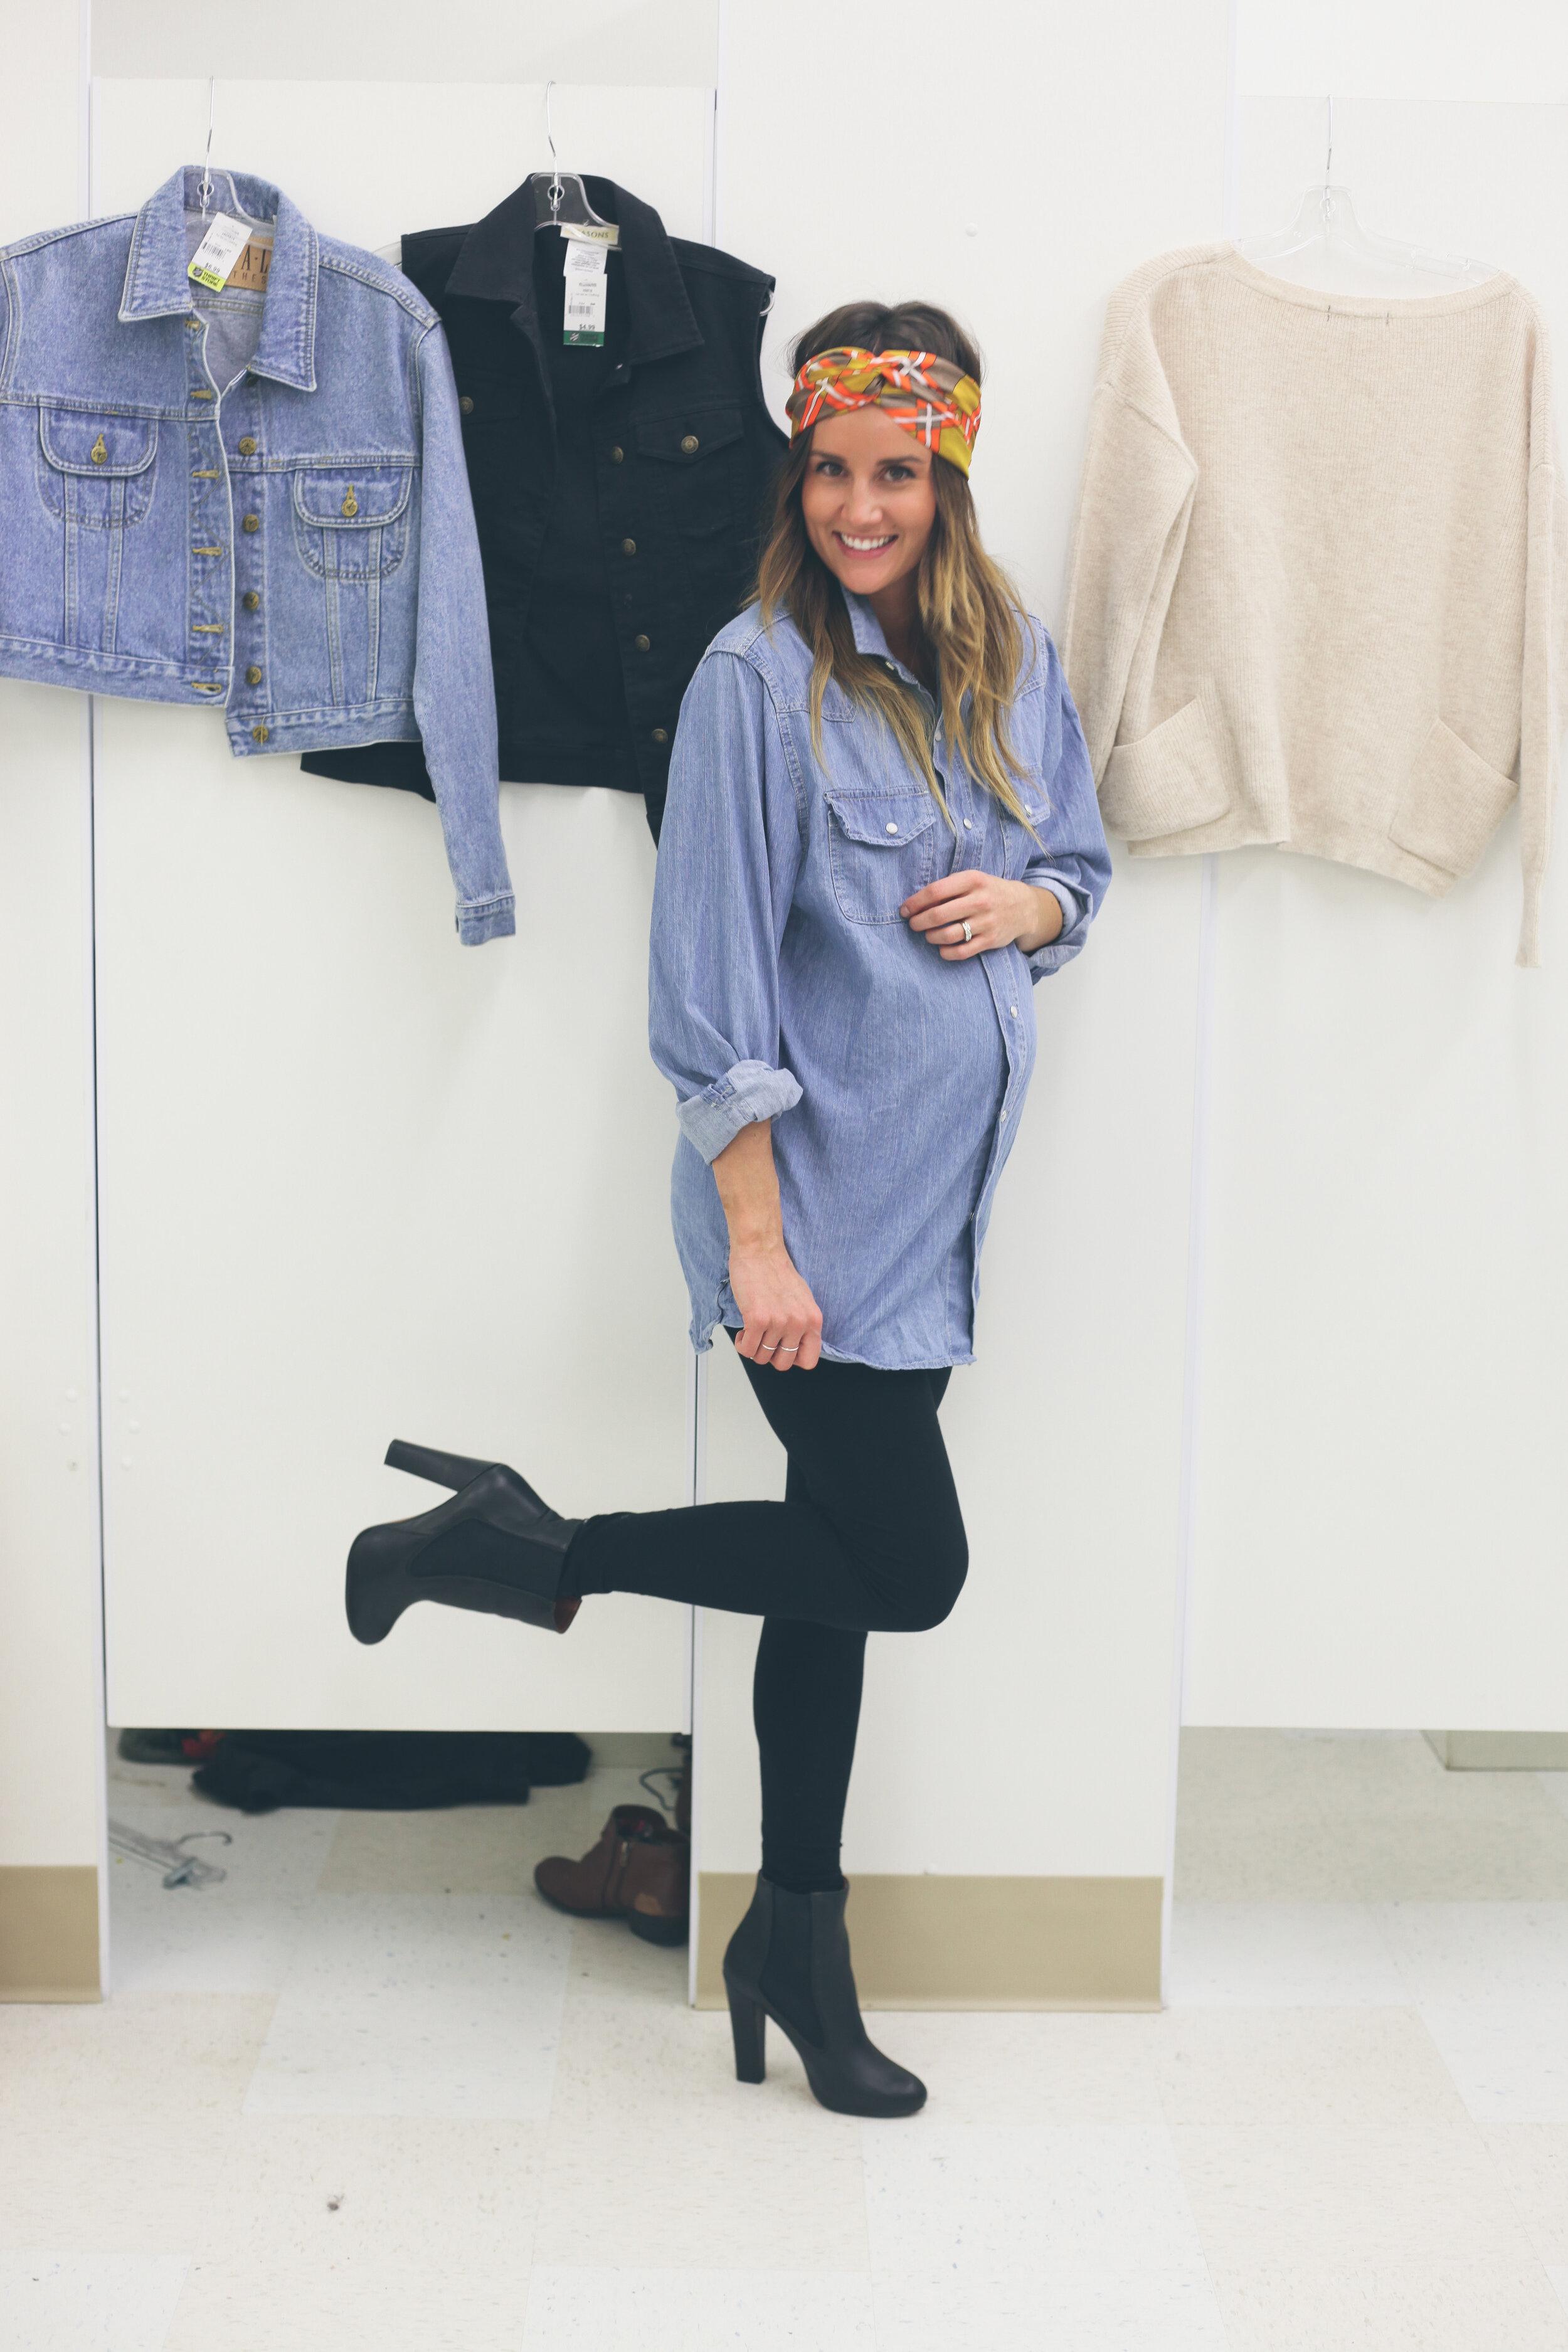 http://treasuresandtravelsblog.com/blog/2014/1/8/thrifting-tips